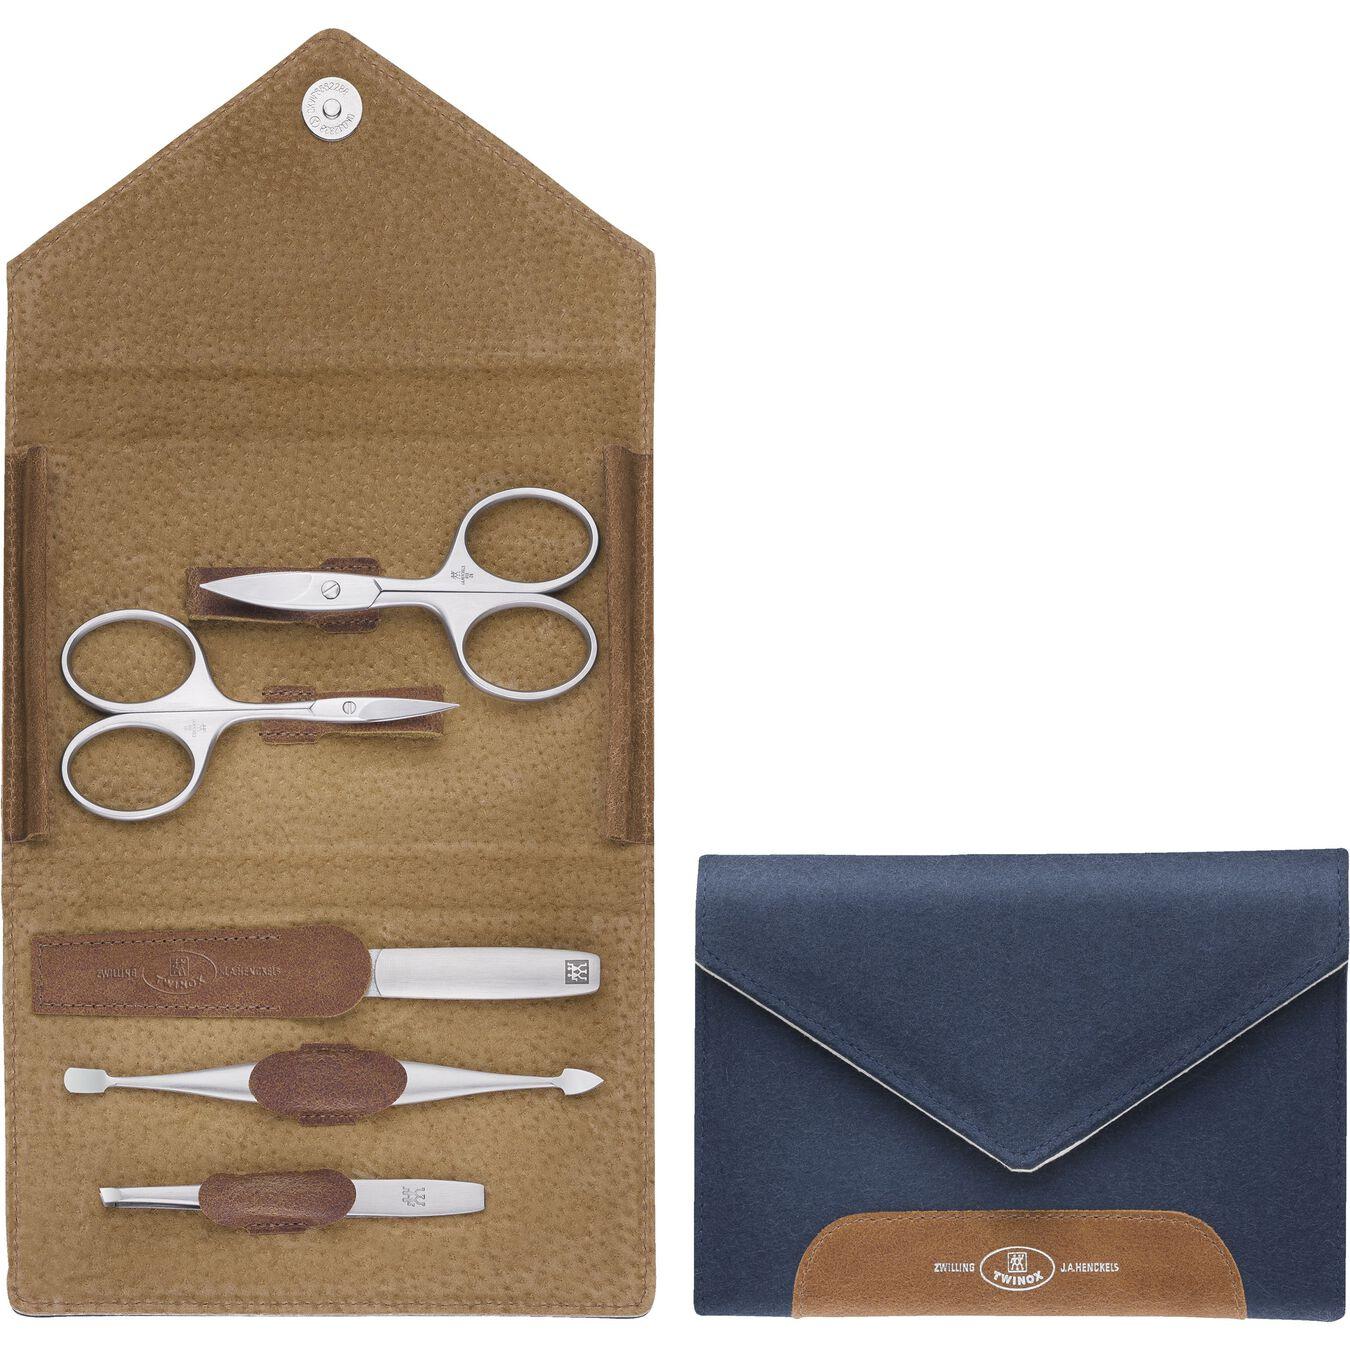 Snap fastener case, 5 Piece | Felt | blue,,large 1